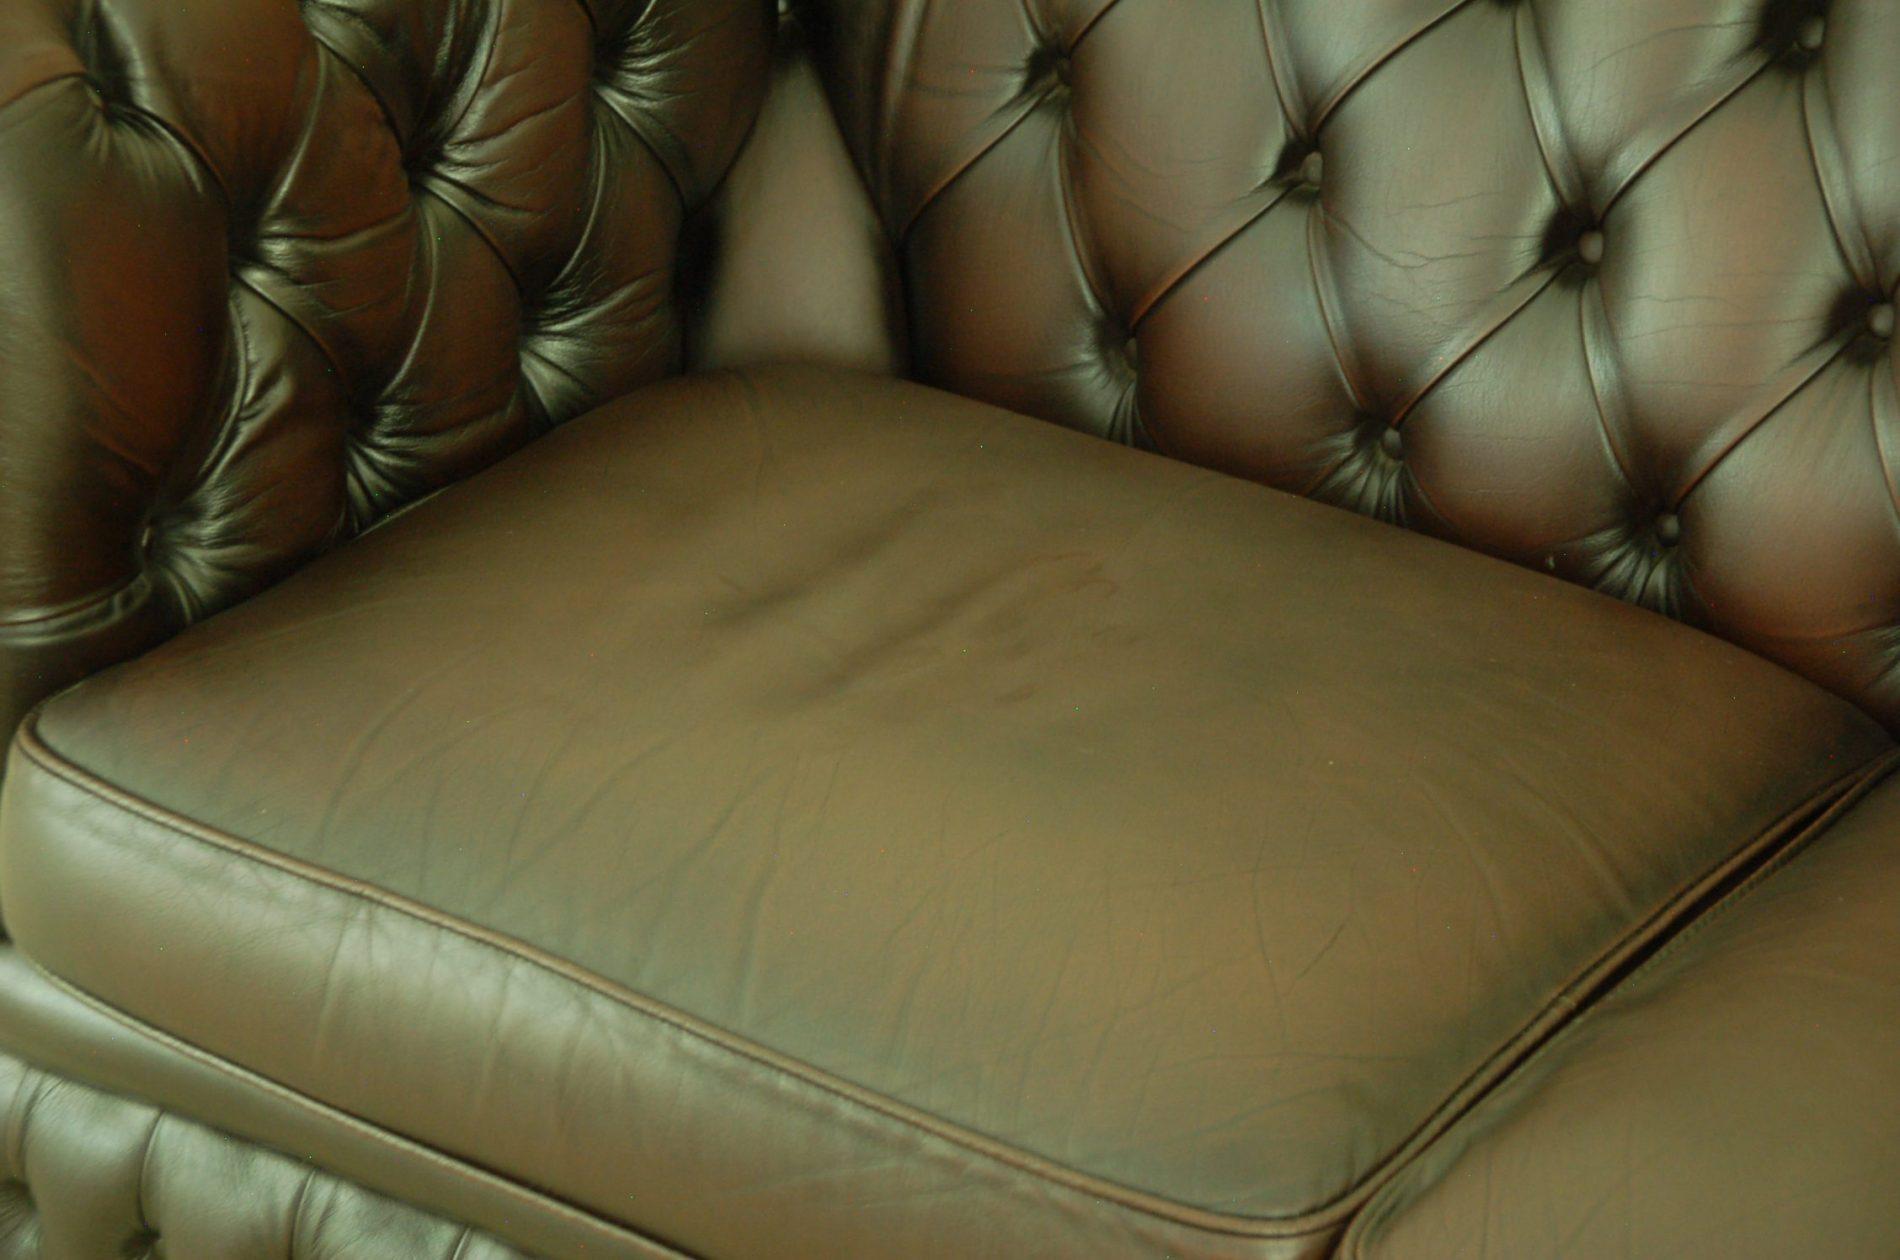 Donker bruine gebruikte chesterfield 2,5 zitter